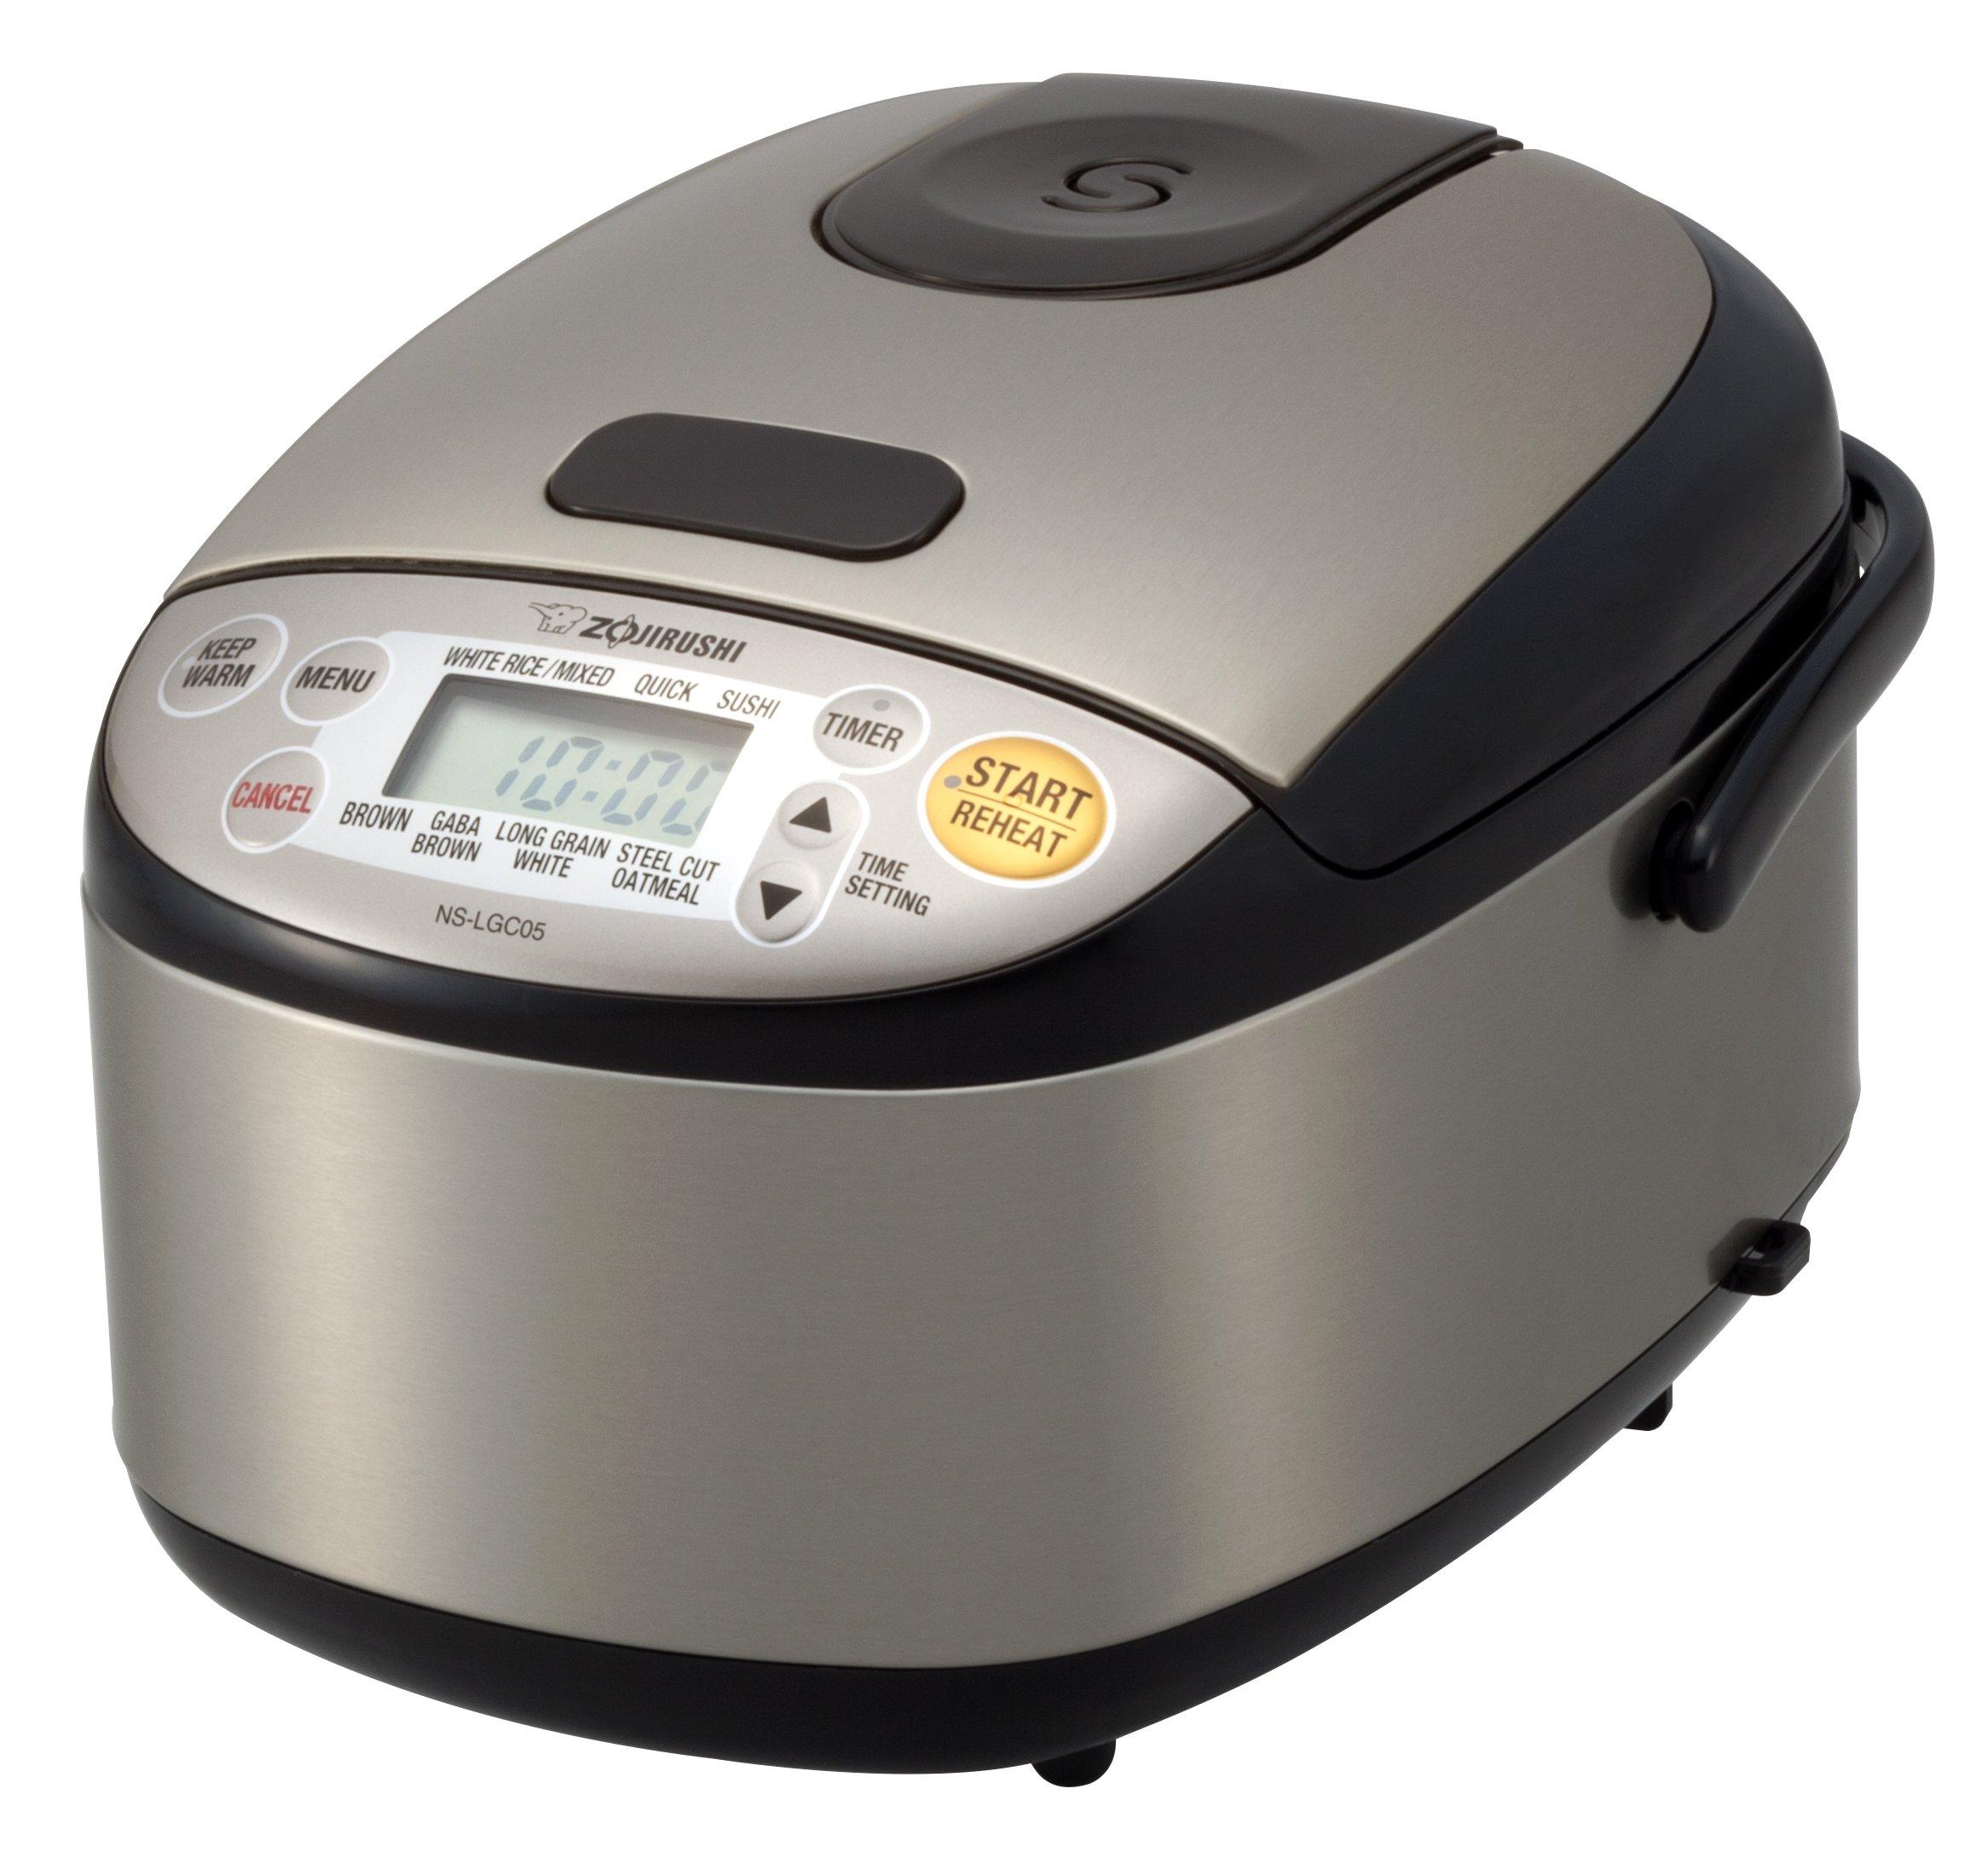 Zojirushi NS LGC05XB Cooker uncooked Stainless